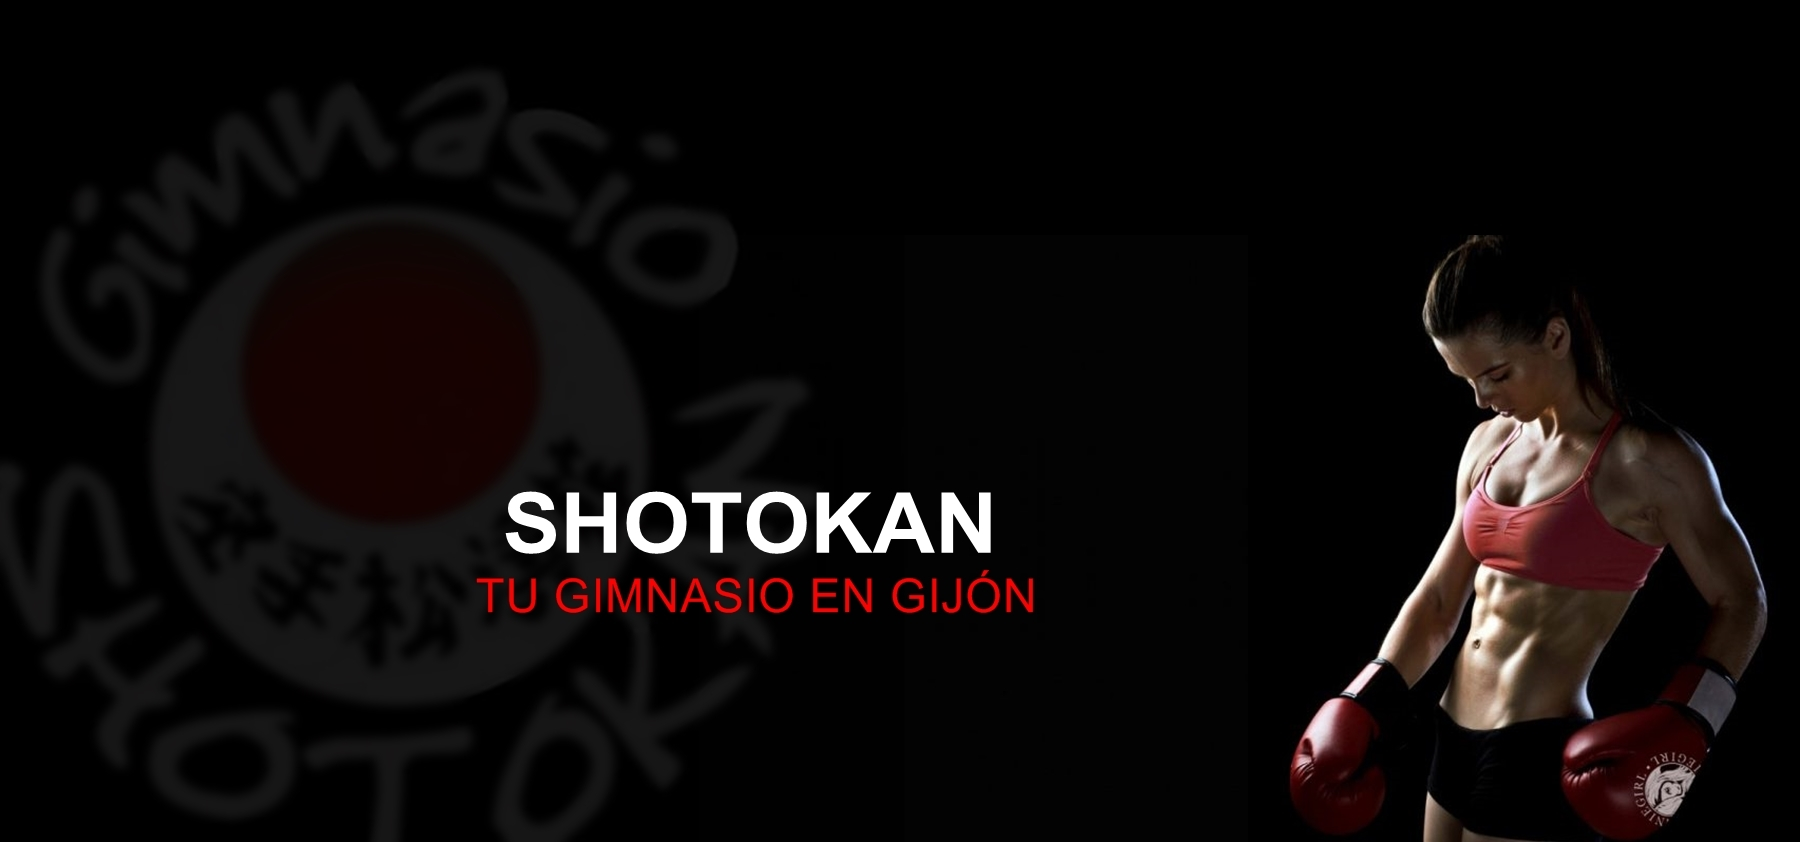 Gimnasio Shotokan - Body Combat -  Tu gimnasio en Gijón